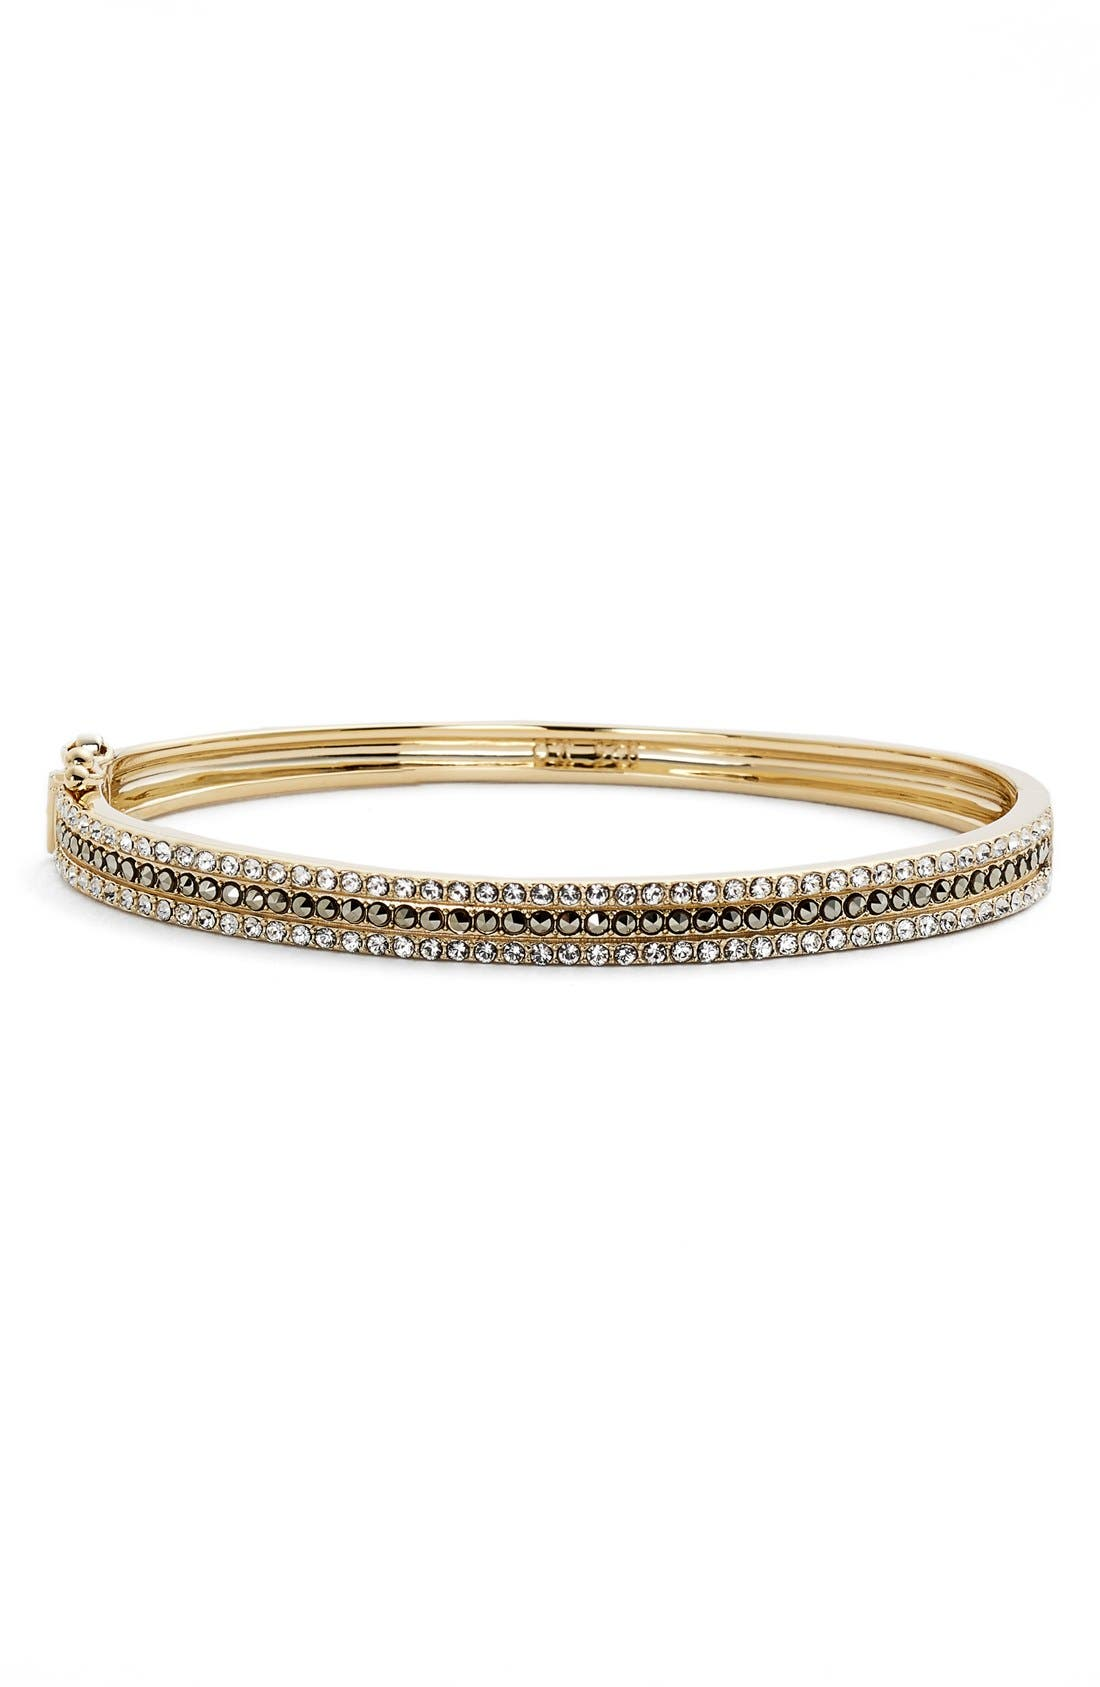 Judith Jack Three Row Bangle Bracelet